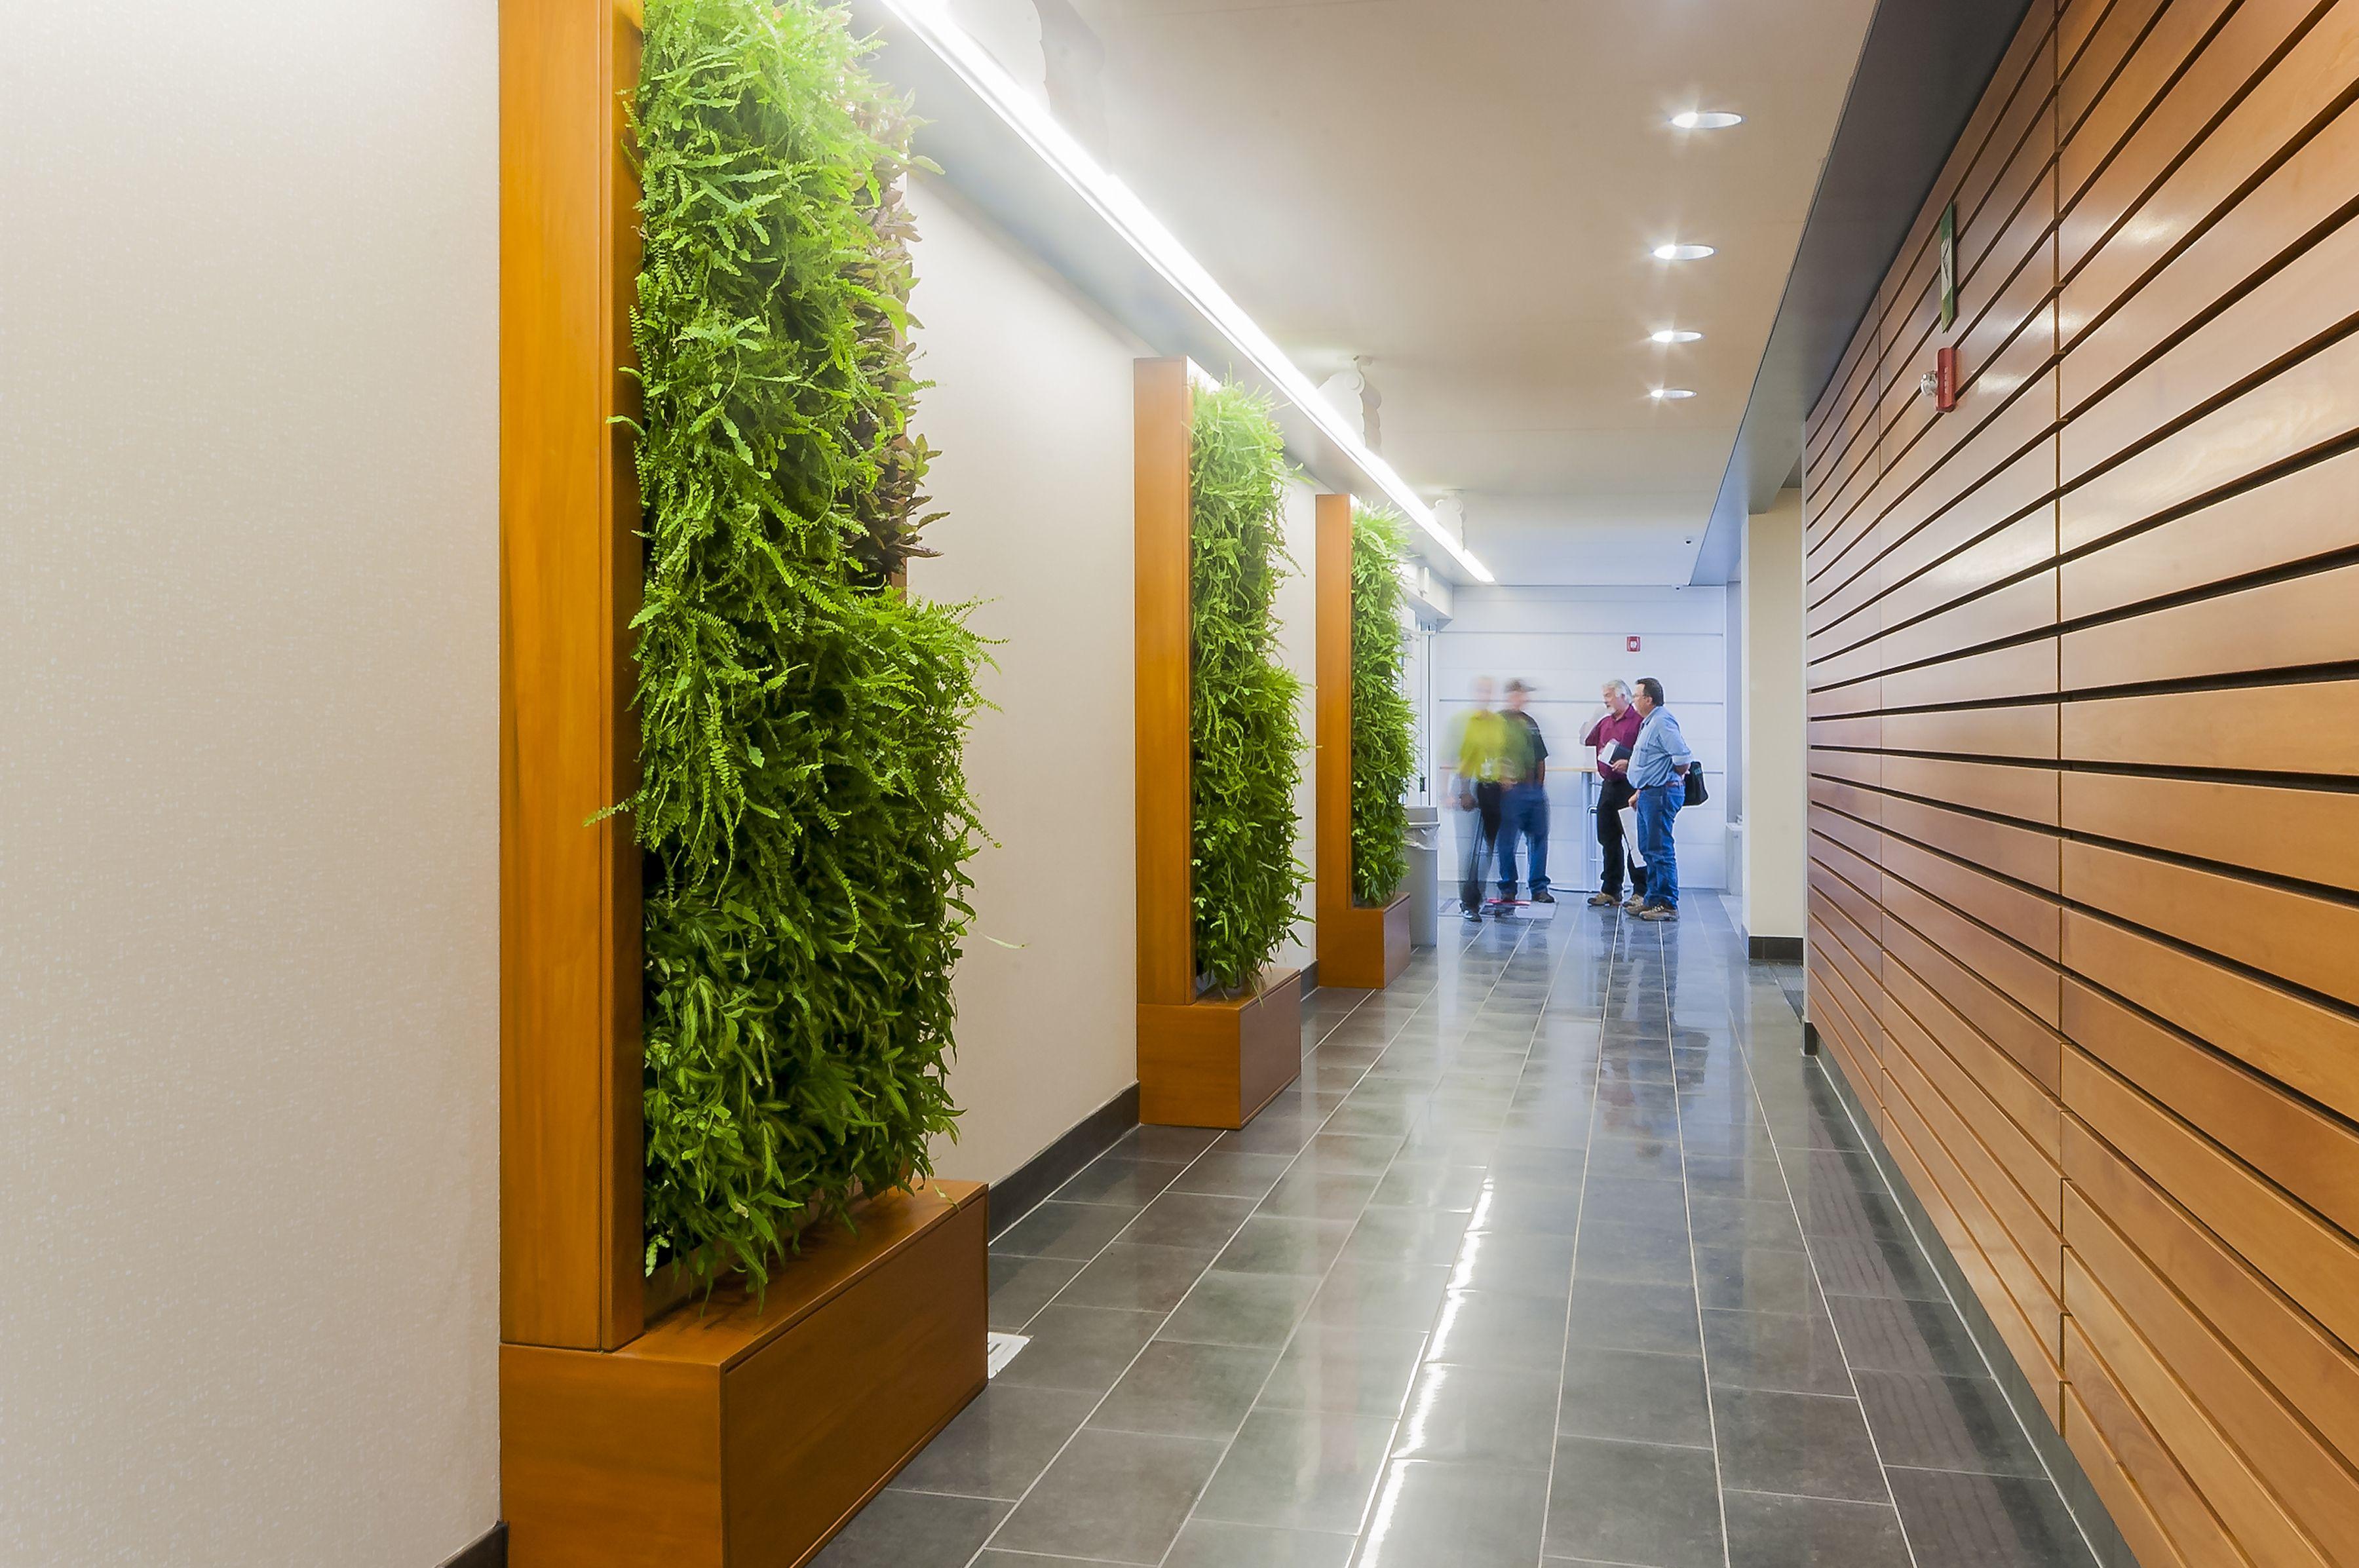 AIMS Community College Platte Building Green Wall Corridor